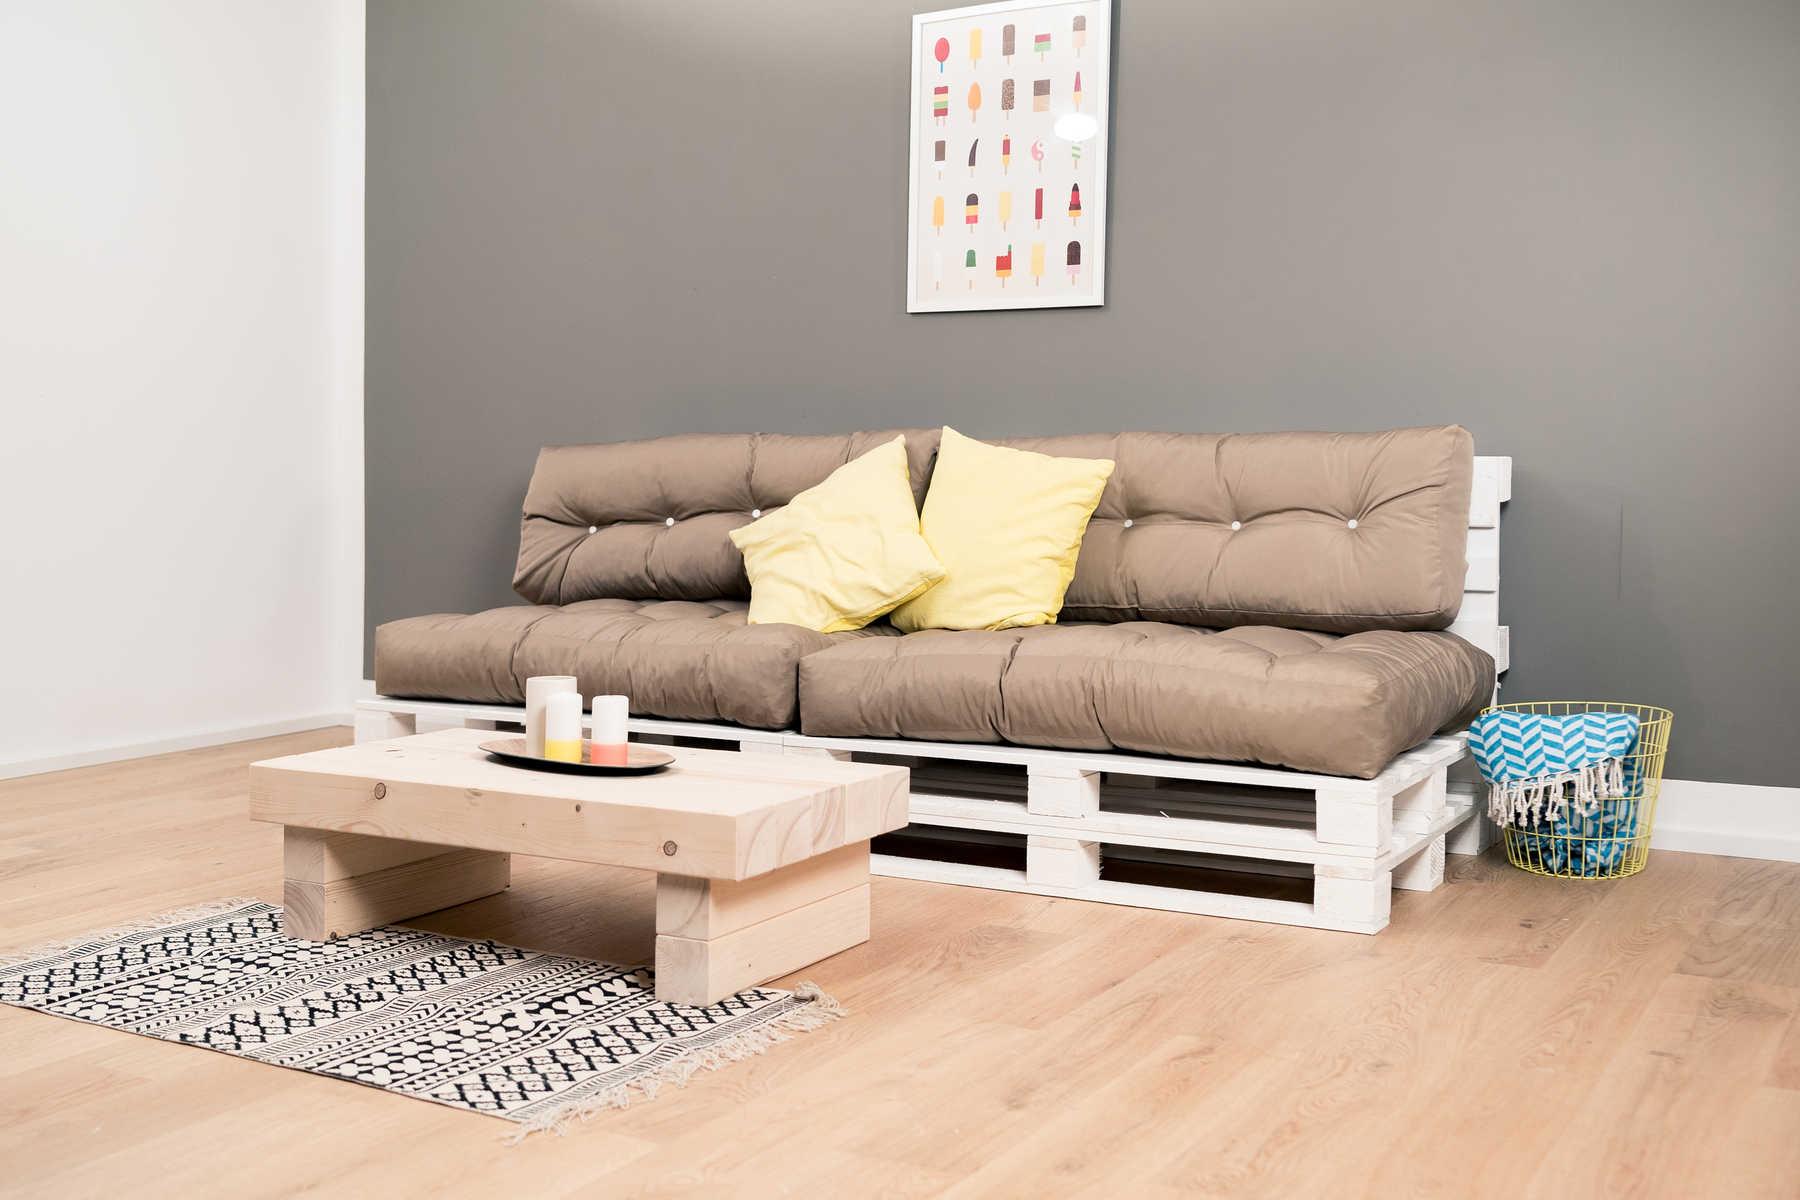 palettensofa anleitung smartstore. Black Bedroom Furniture Sets. Home Design Ideas